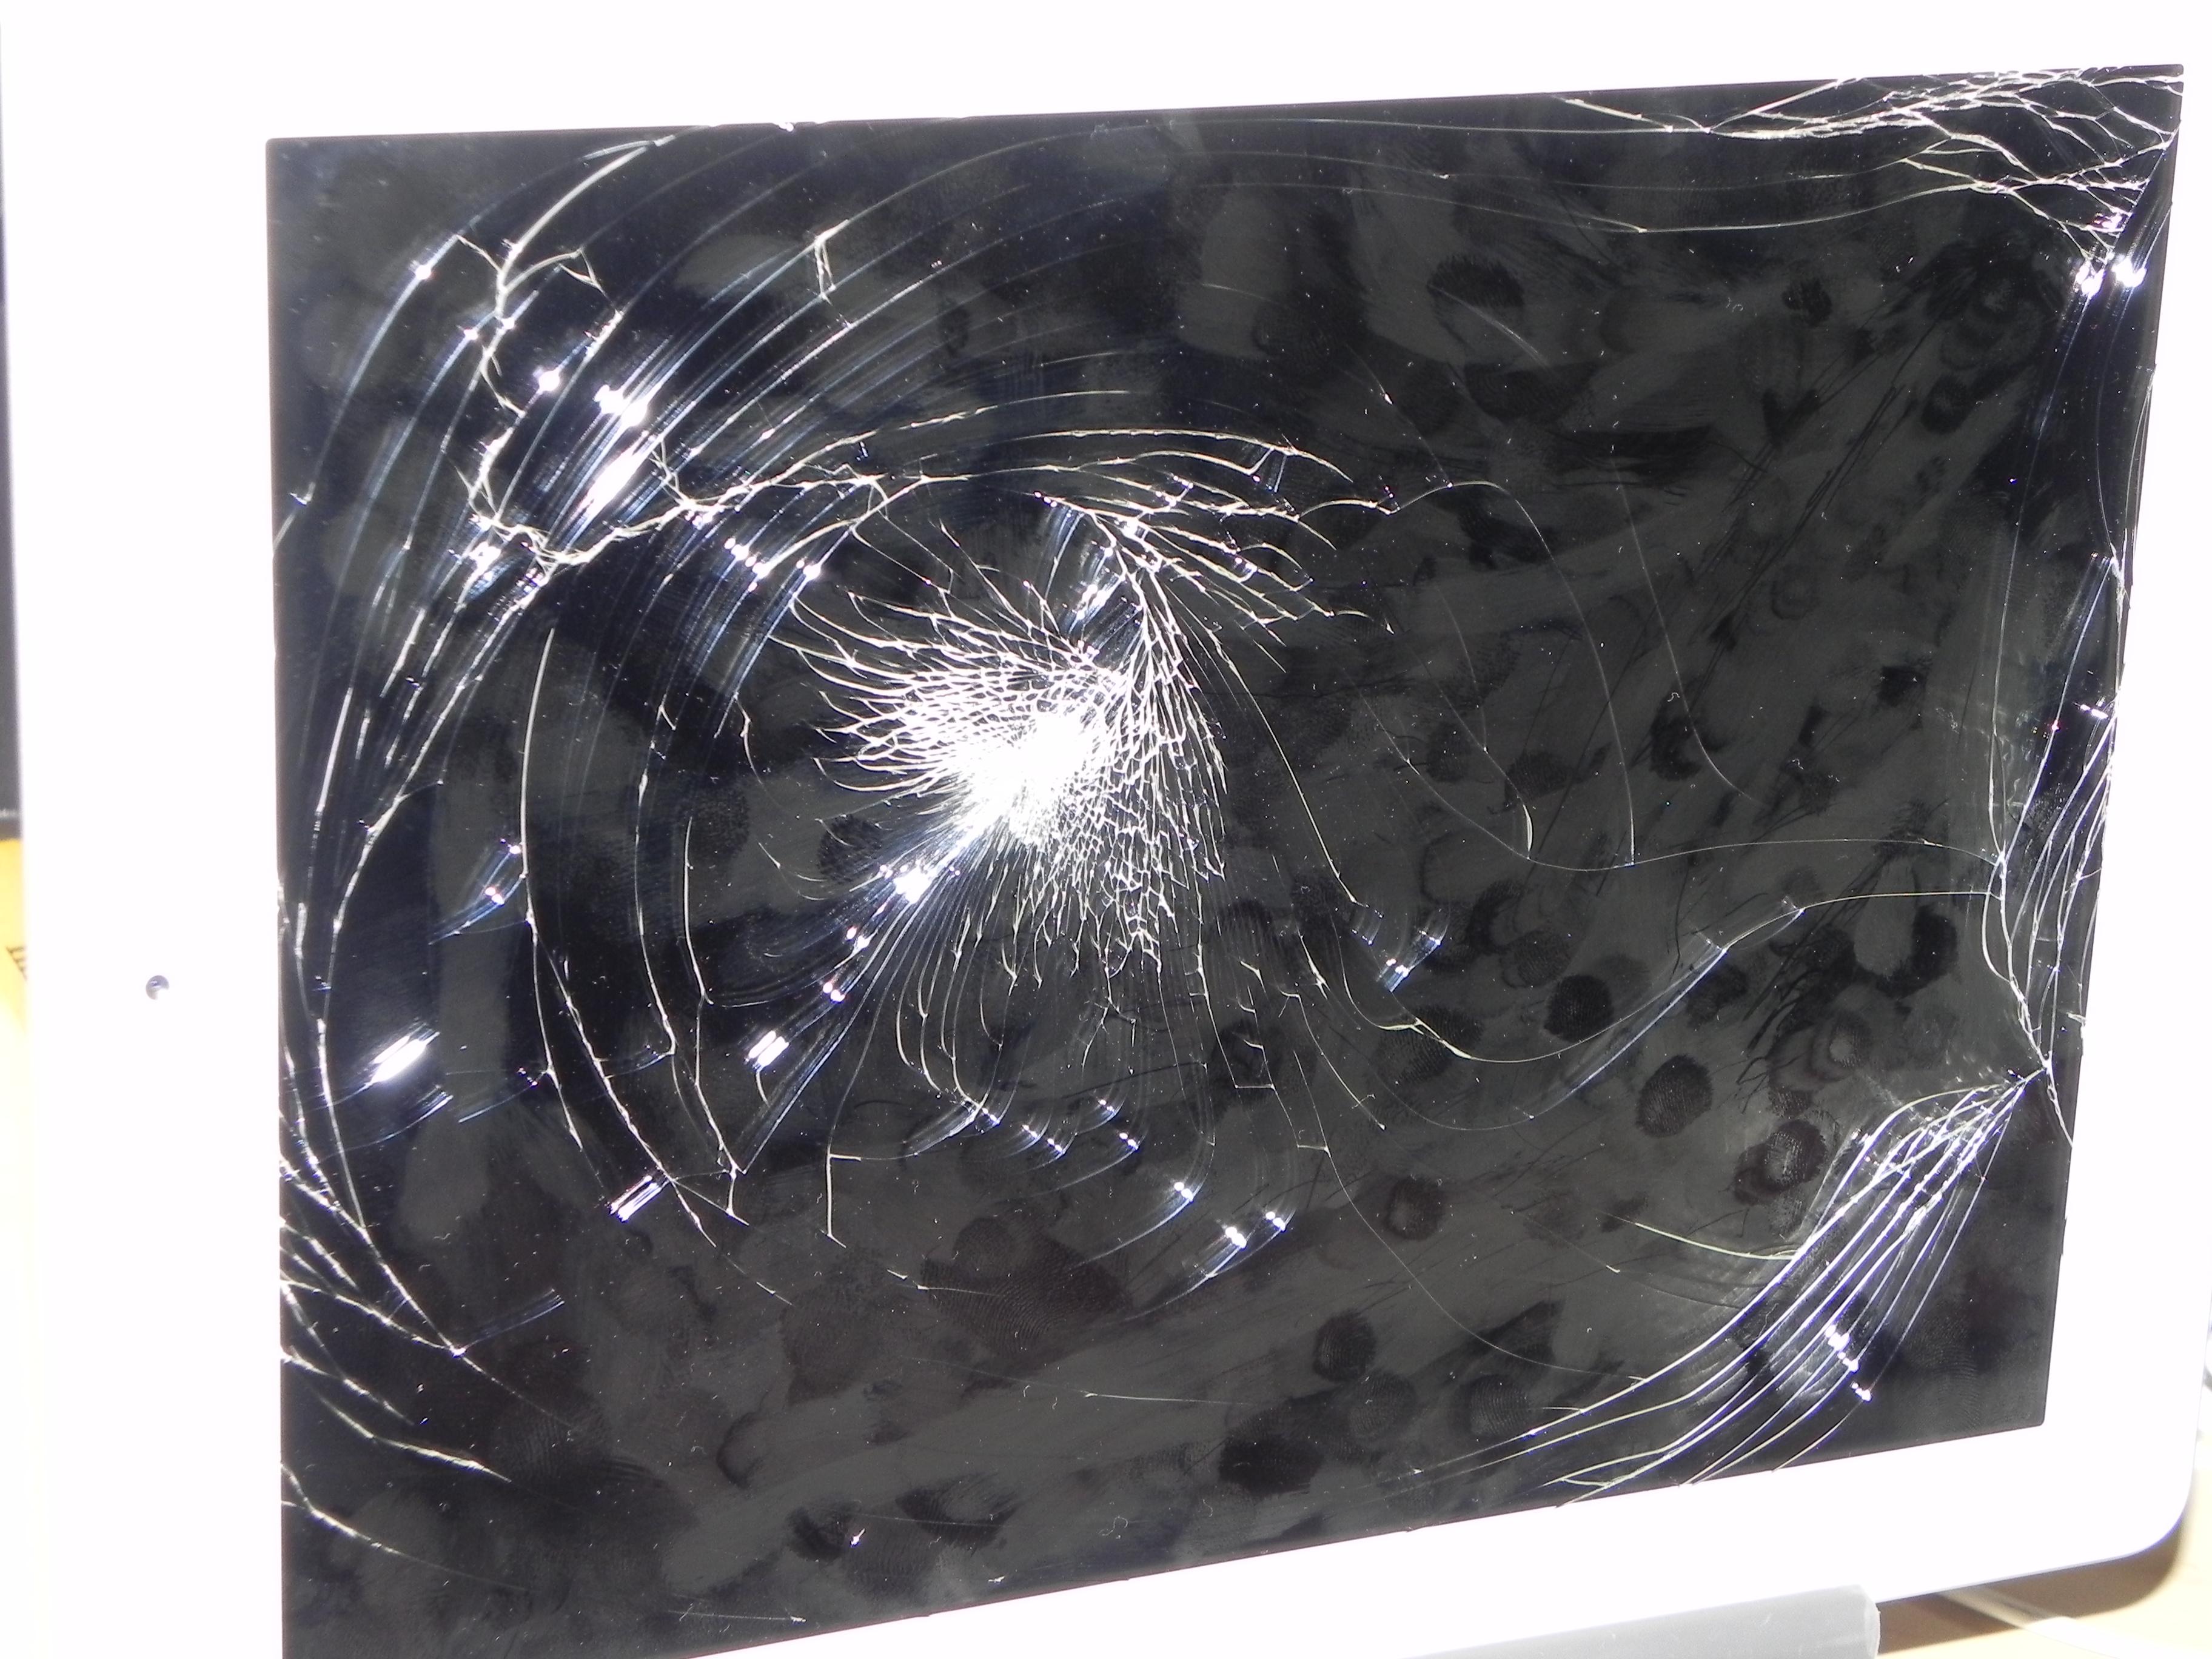 New iPad (iPad 3): Apple's most breakable tablet yet? - PC & Tech ...